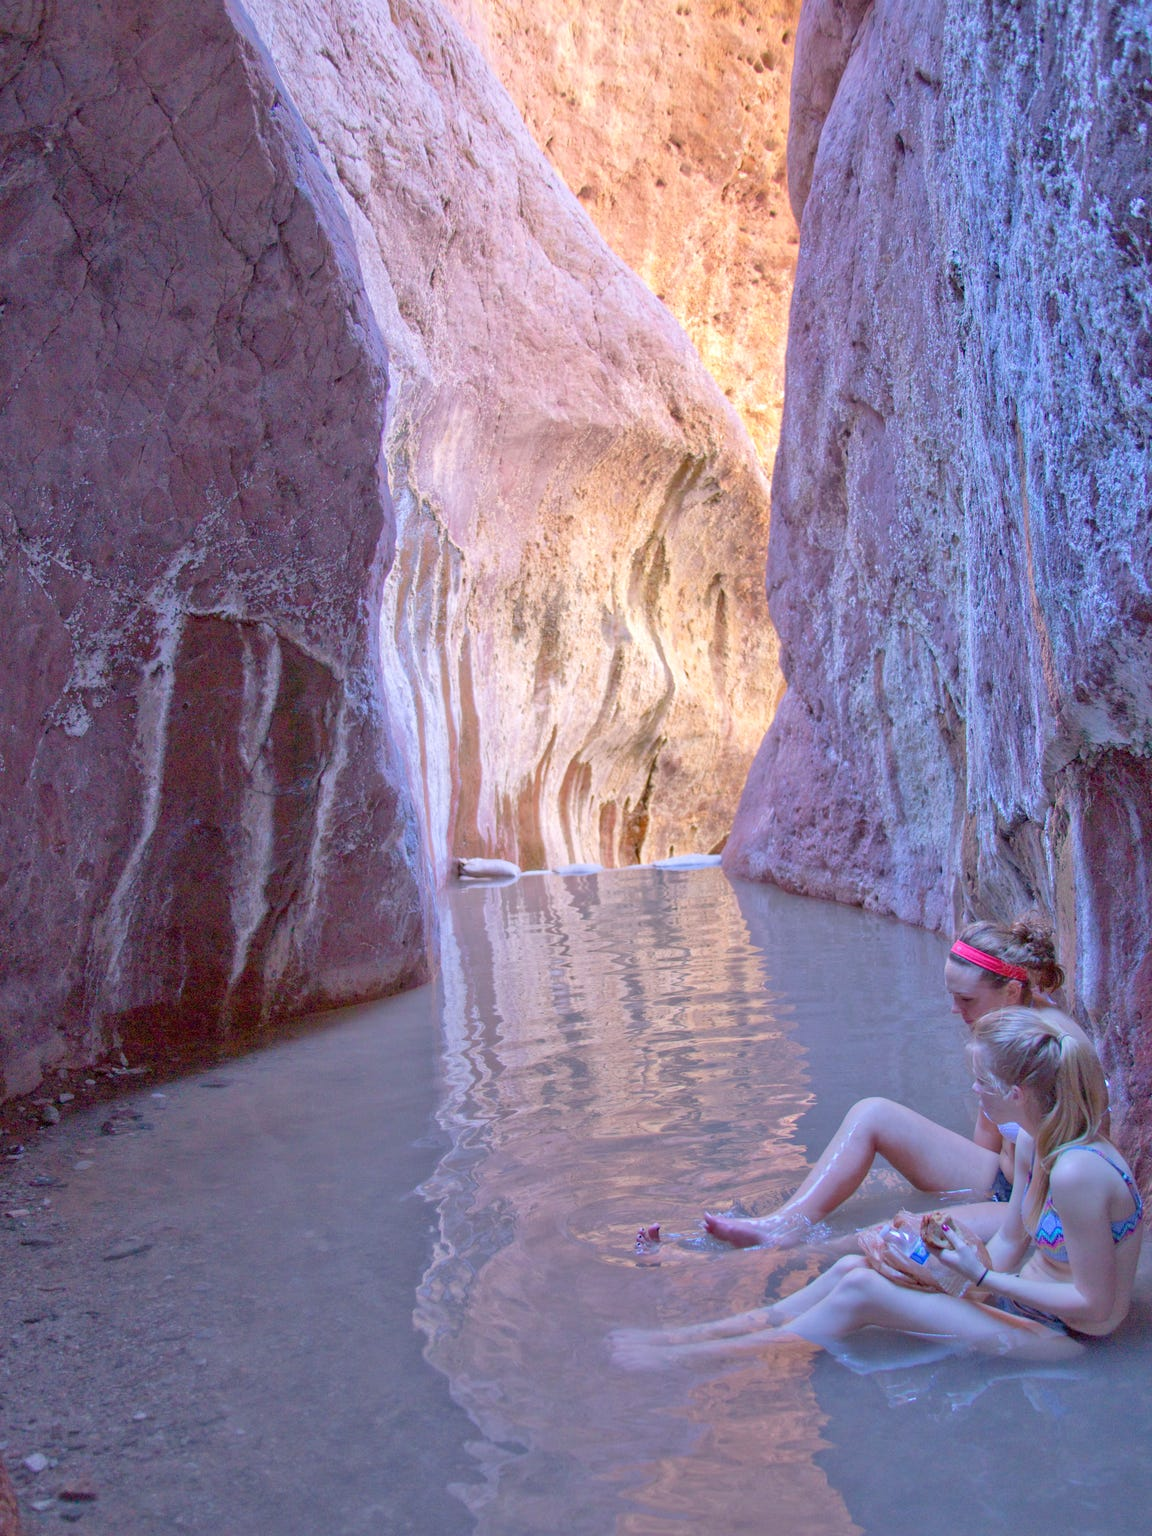 Arizona Hot Springs, Arizona